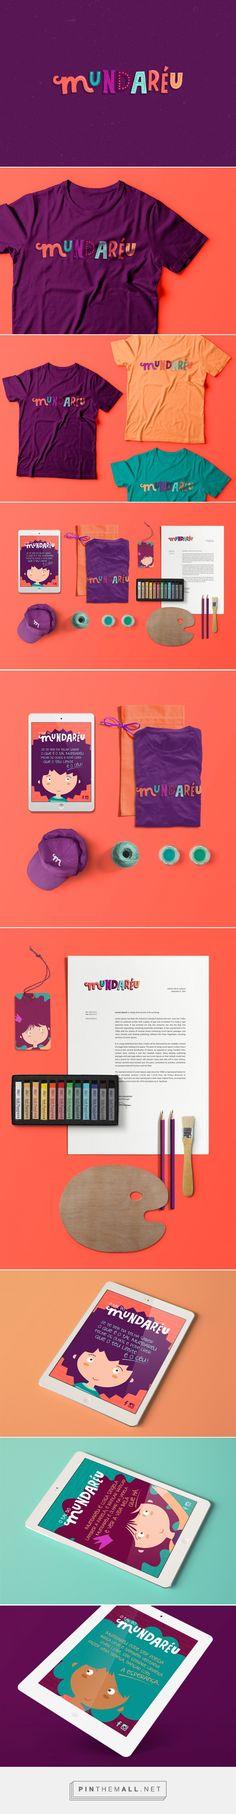 Mundaréu Identity by Carmelita Design on Behance | Fivestar Branding – Design and Branding Agency & Inspiration Gallery